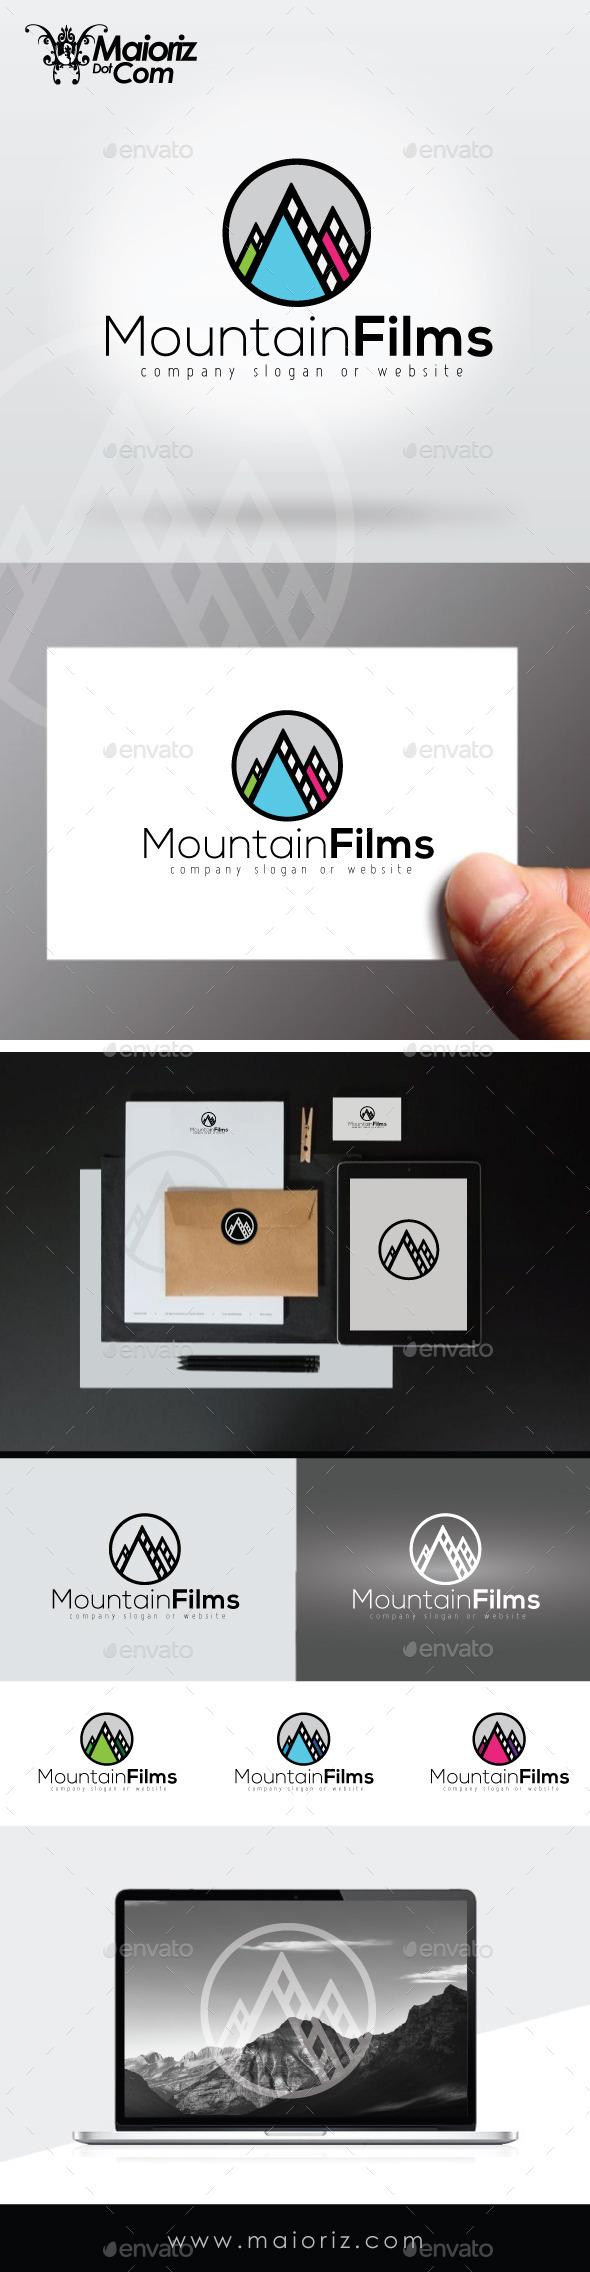 Mountain Films Logo Template - Nature Logo Templates